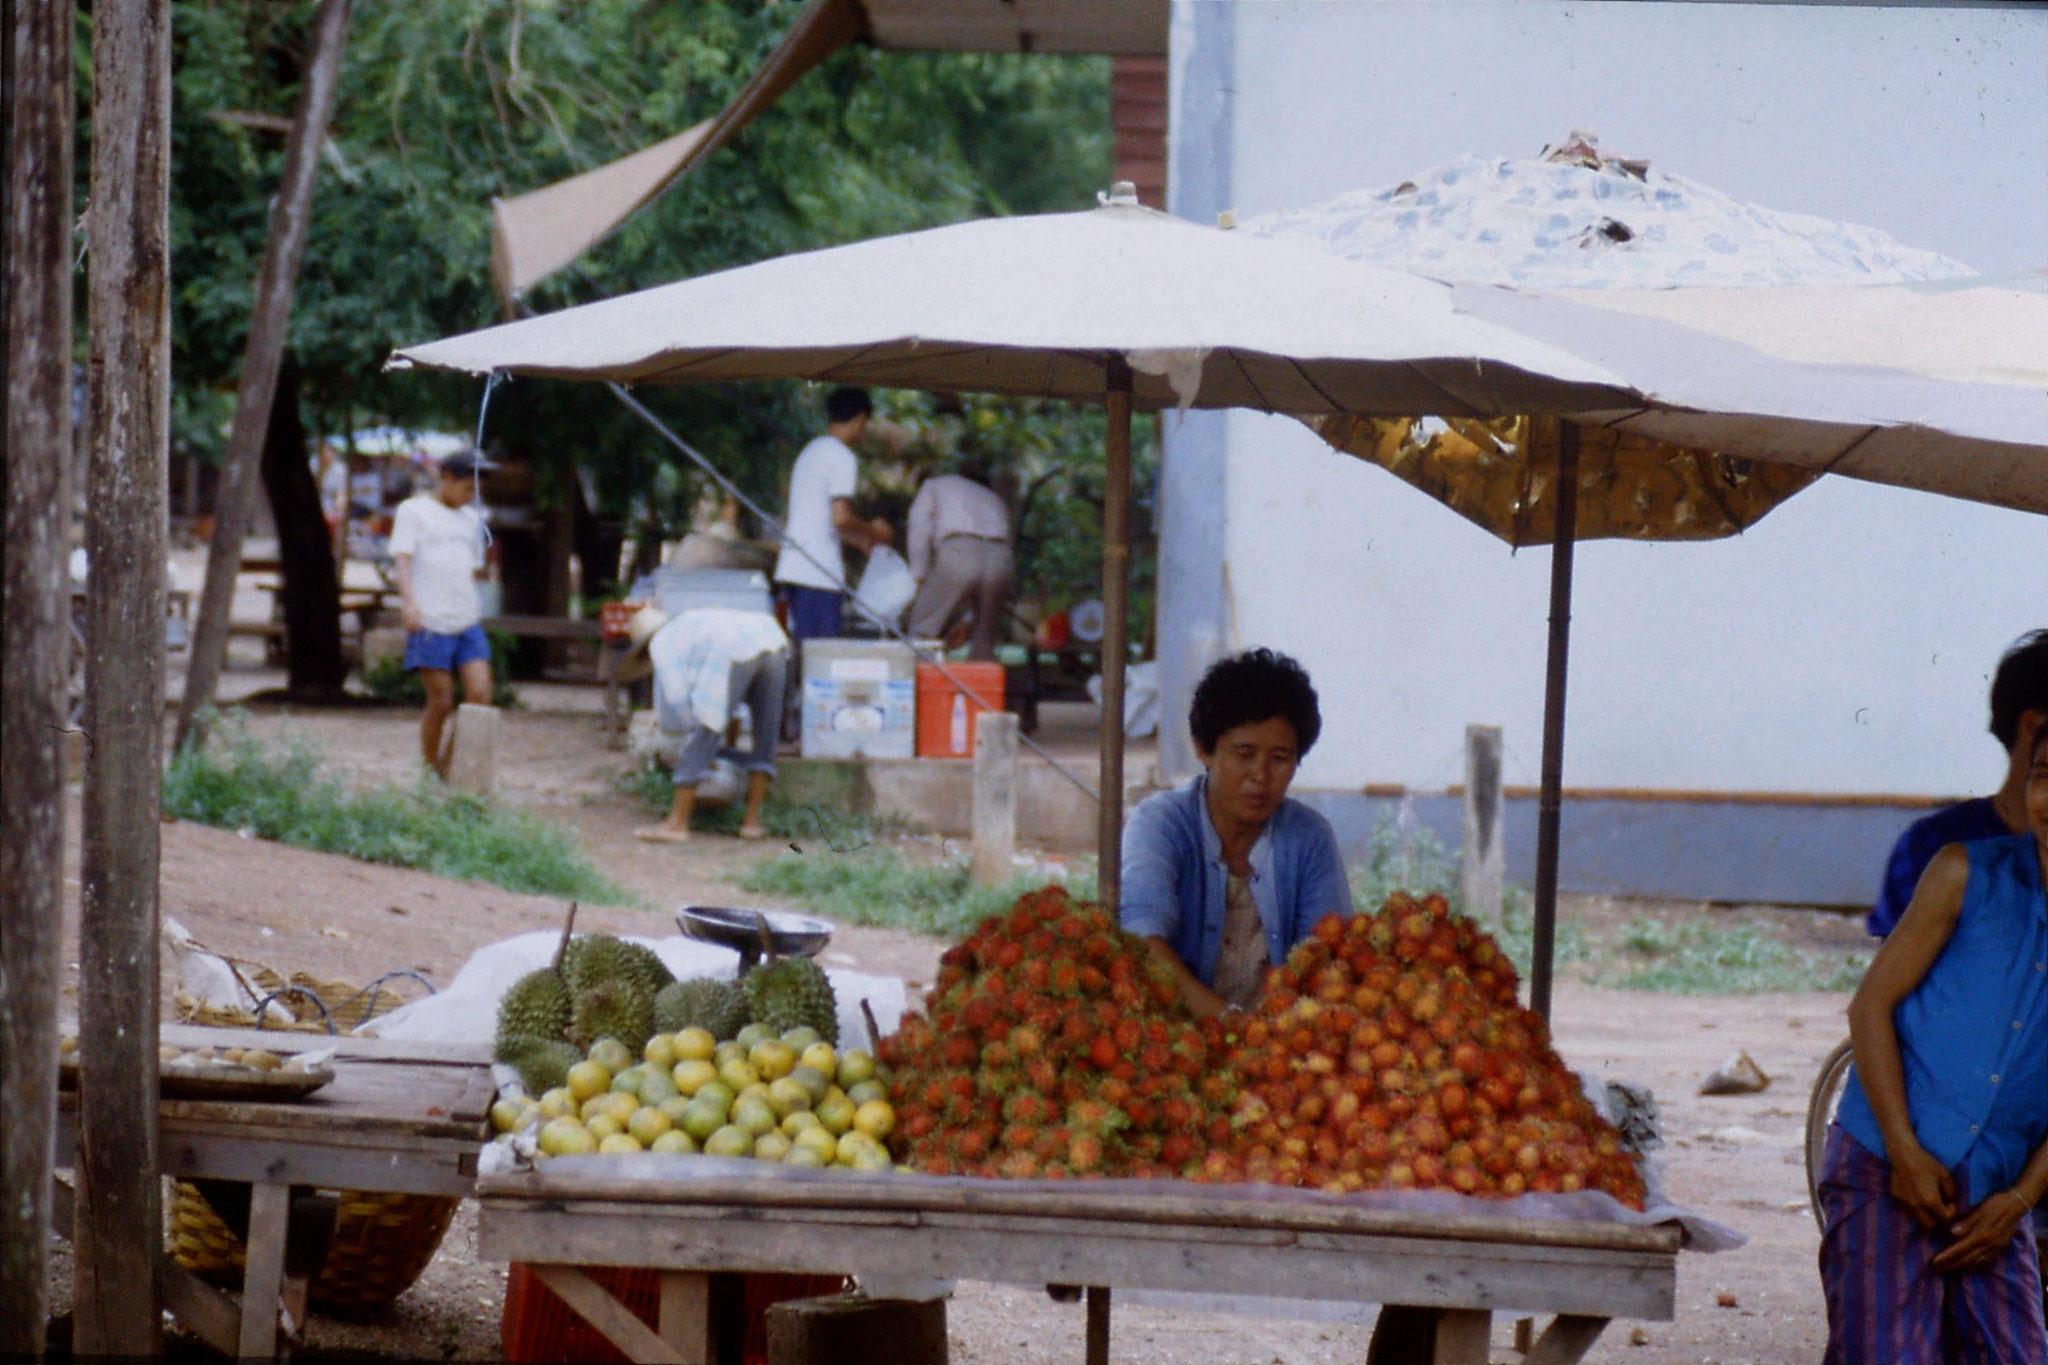 30/5/1990: 29: Nong Khai market